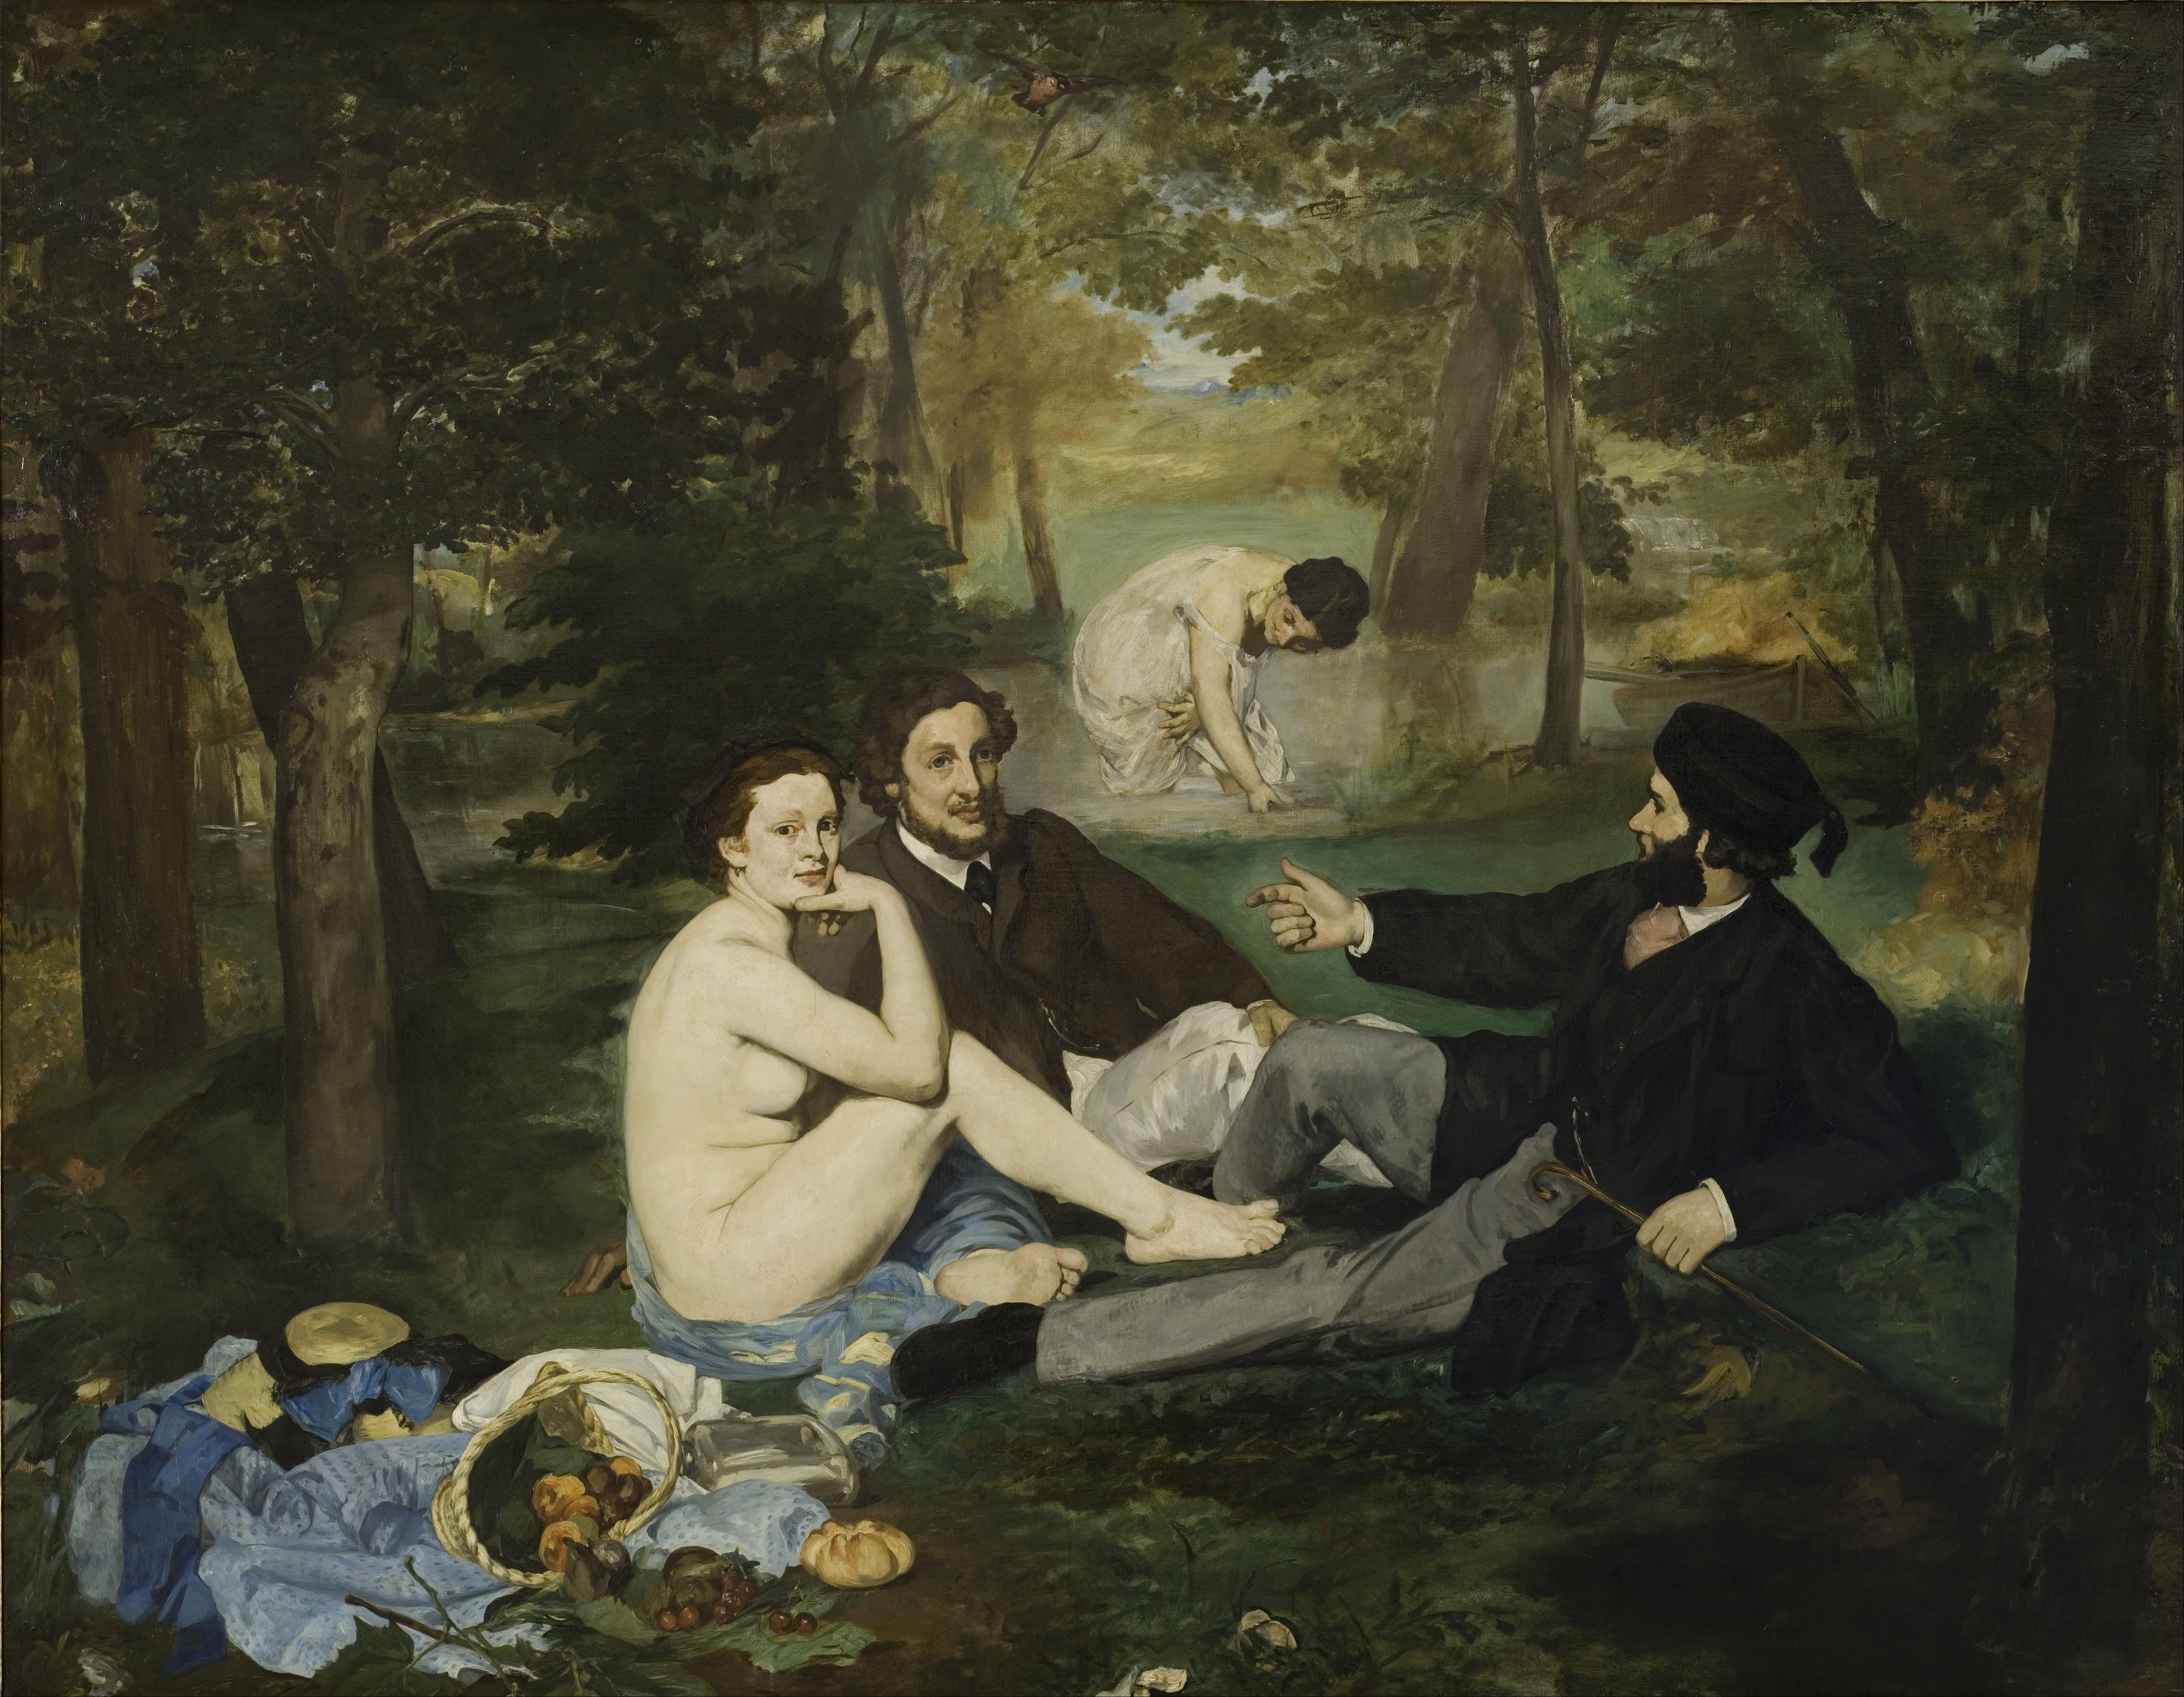 https://lartediguardarelarte.altervista.org/wp-content/uploads/2017/08/Edouard_Manet_-_Luncheon_on_the_Grass_-_Google_Art_Project.jpg